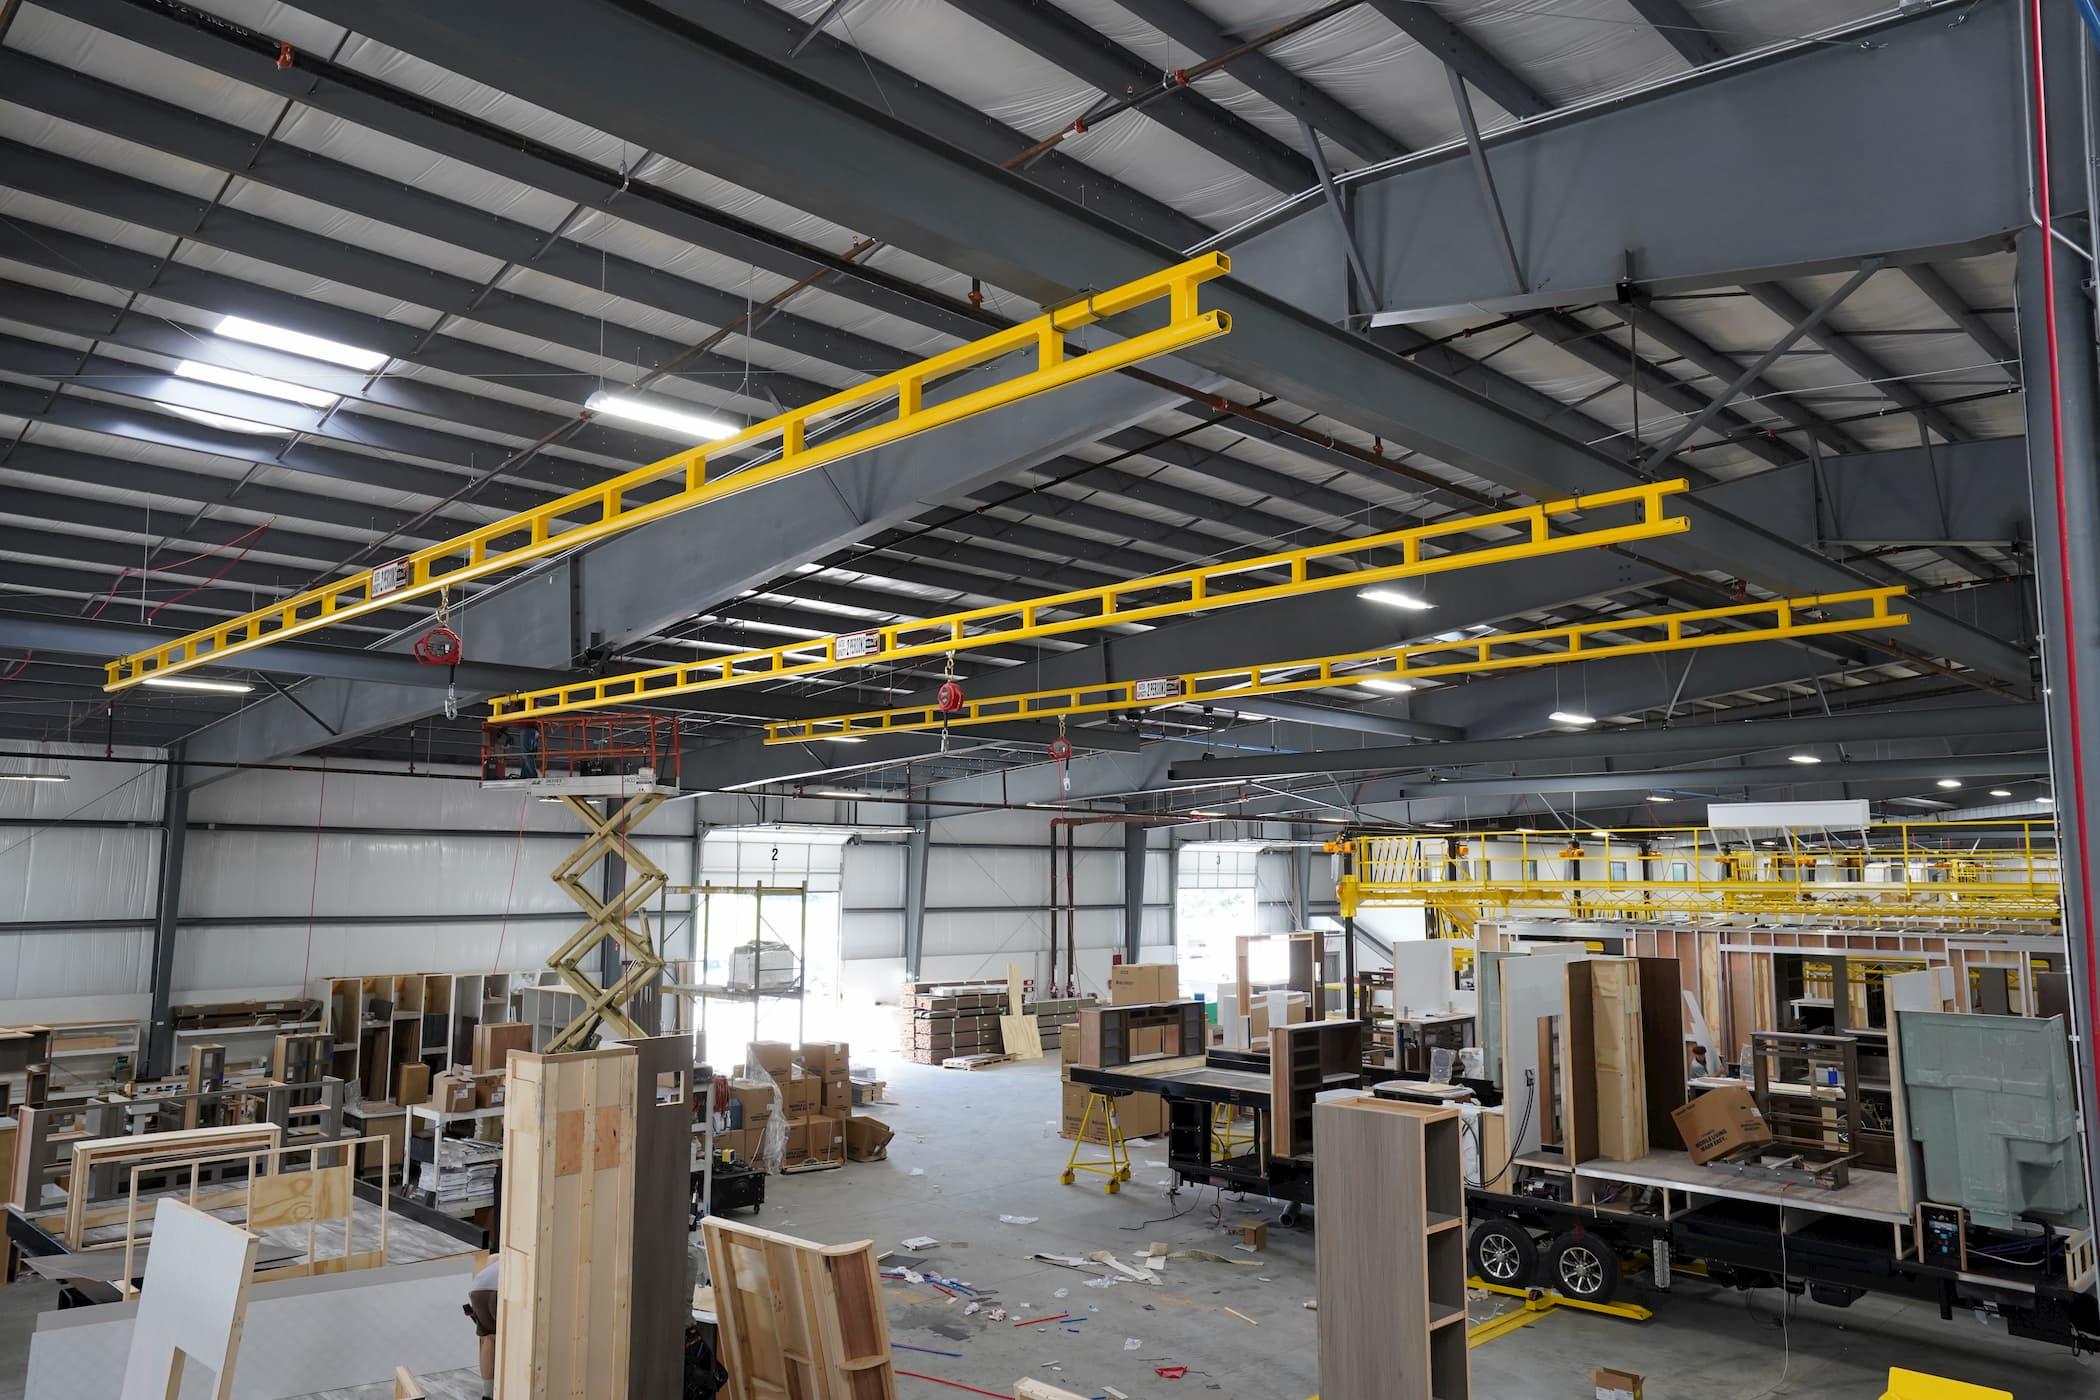 Rigid Enclosed Track Fall Protection